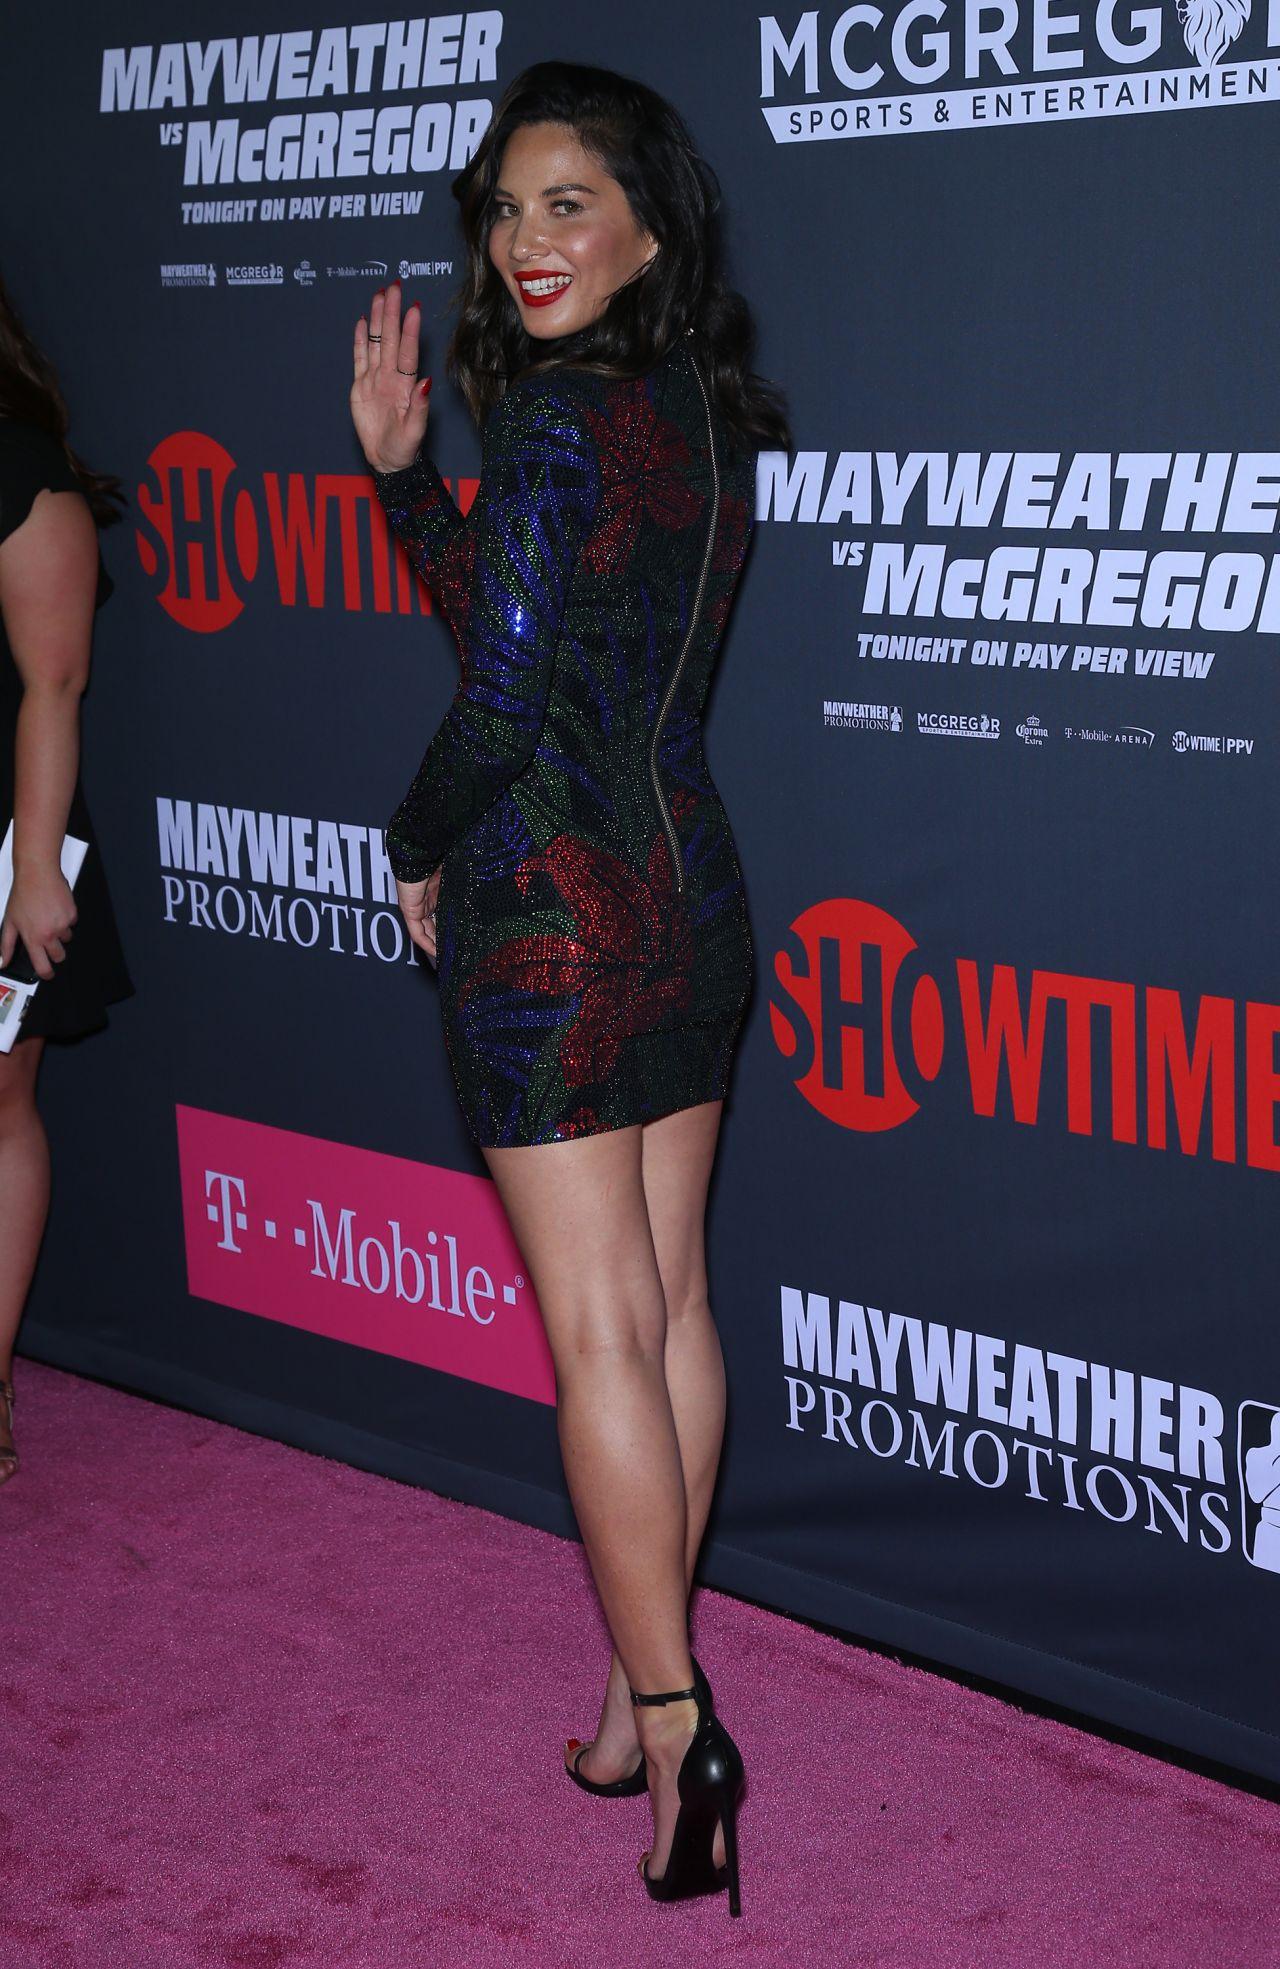 Olivia Munn Mayweather Vs Mcgregor Pre Fight Vip Red Carpet In Las Vegas 08 26 2017